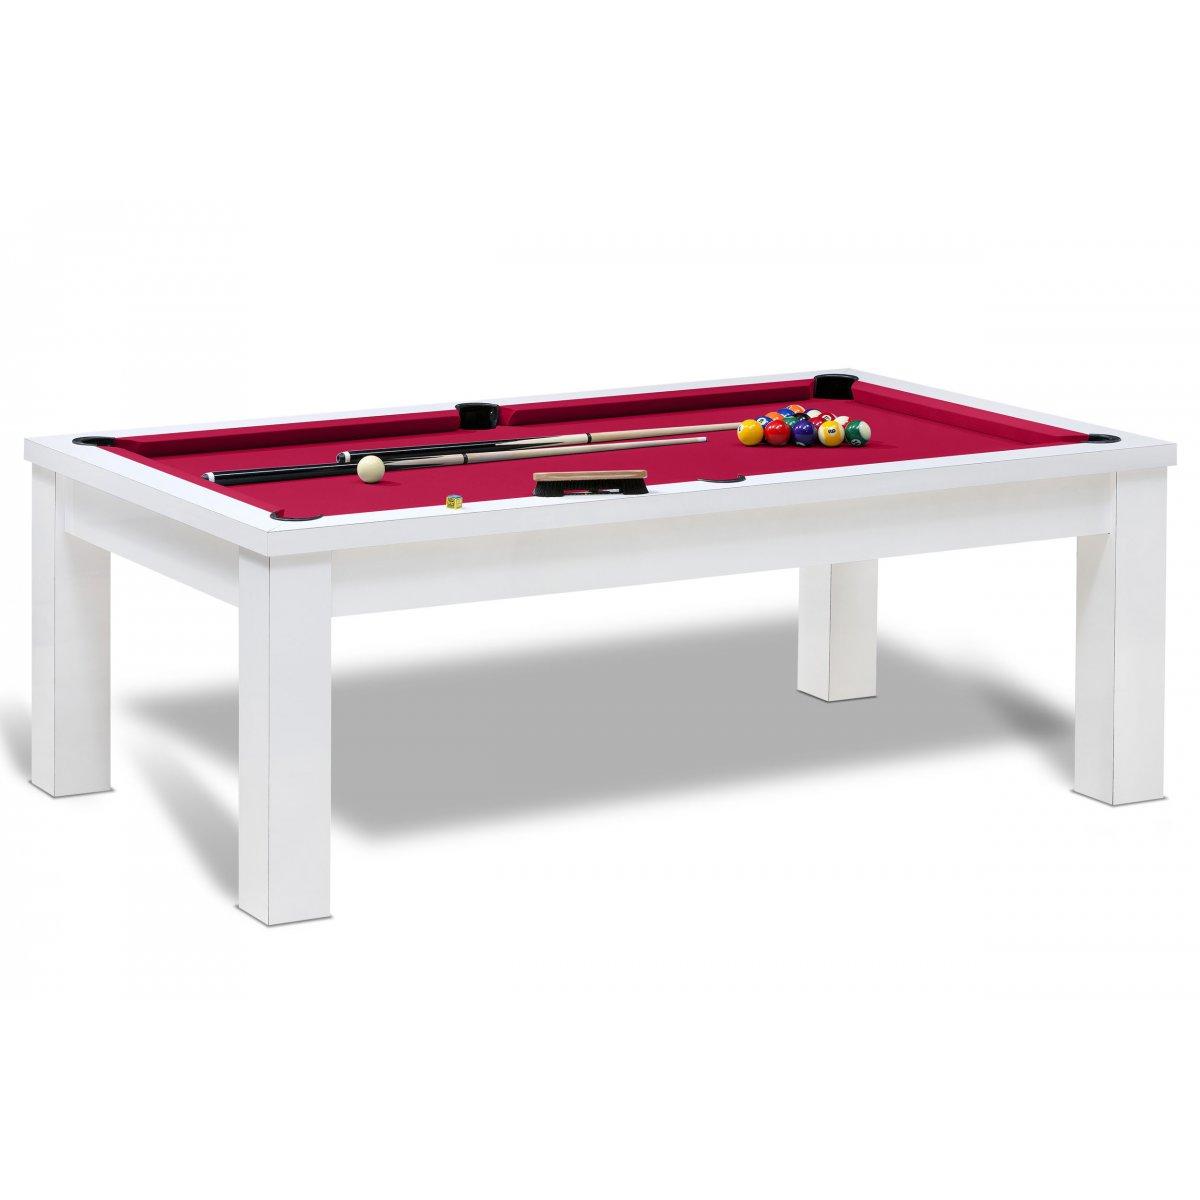 jouer au billard avec ce sublime billard americain blanc et son tapis rouge simonis 760